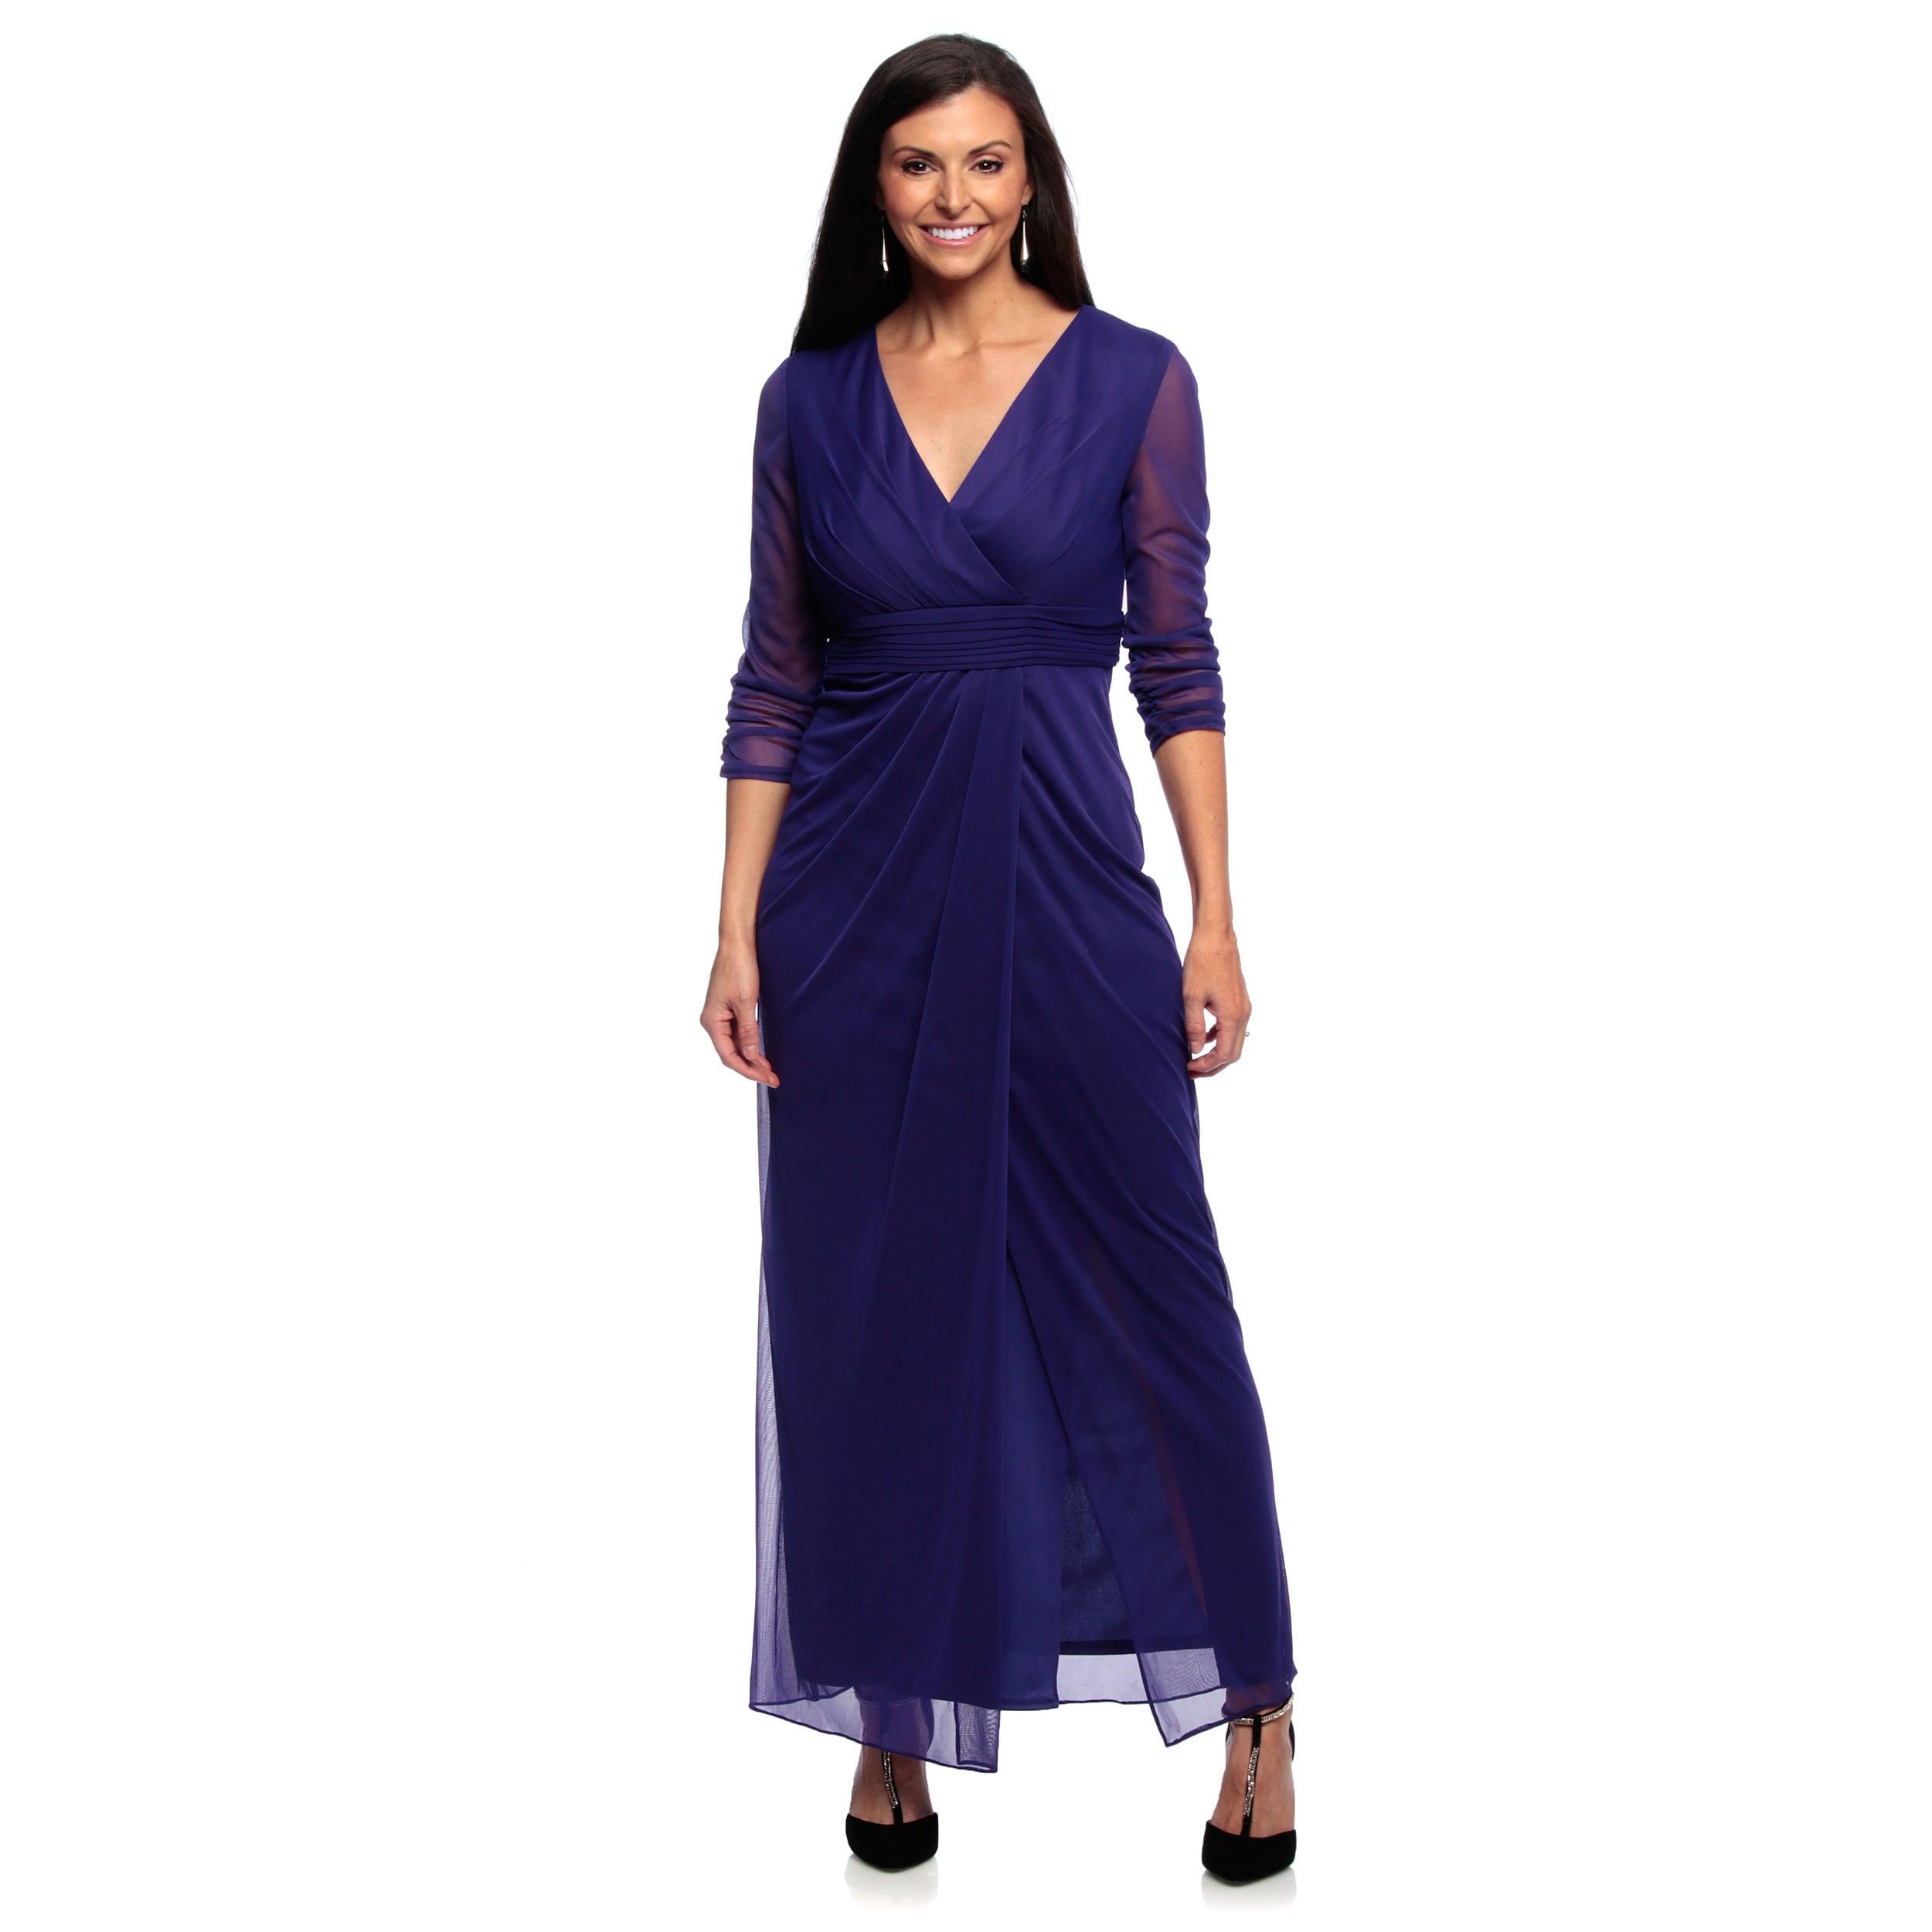 4225737f832f Petite Long Formal Evening Dresses - raveitsafe